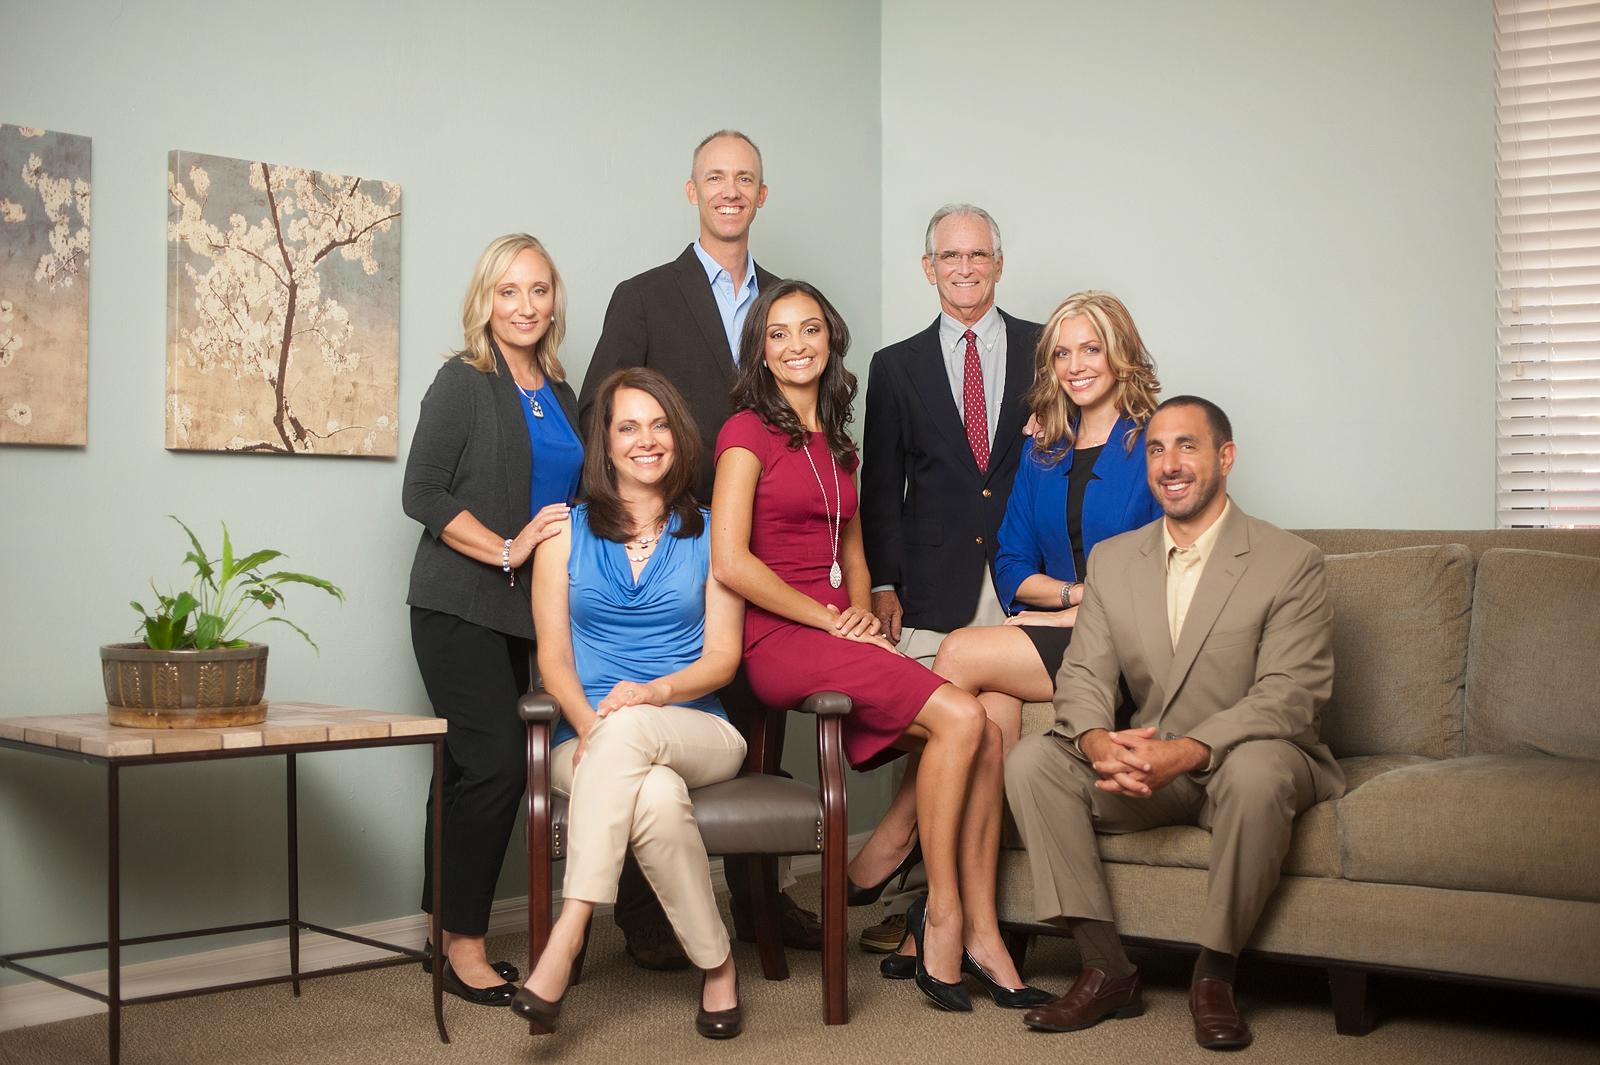 07-psychiatrists-doctor-office-group-photo-office-headshots.jpg